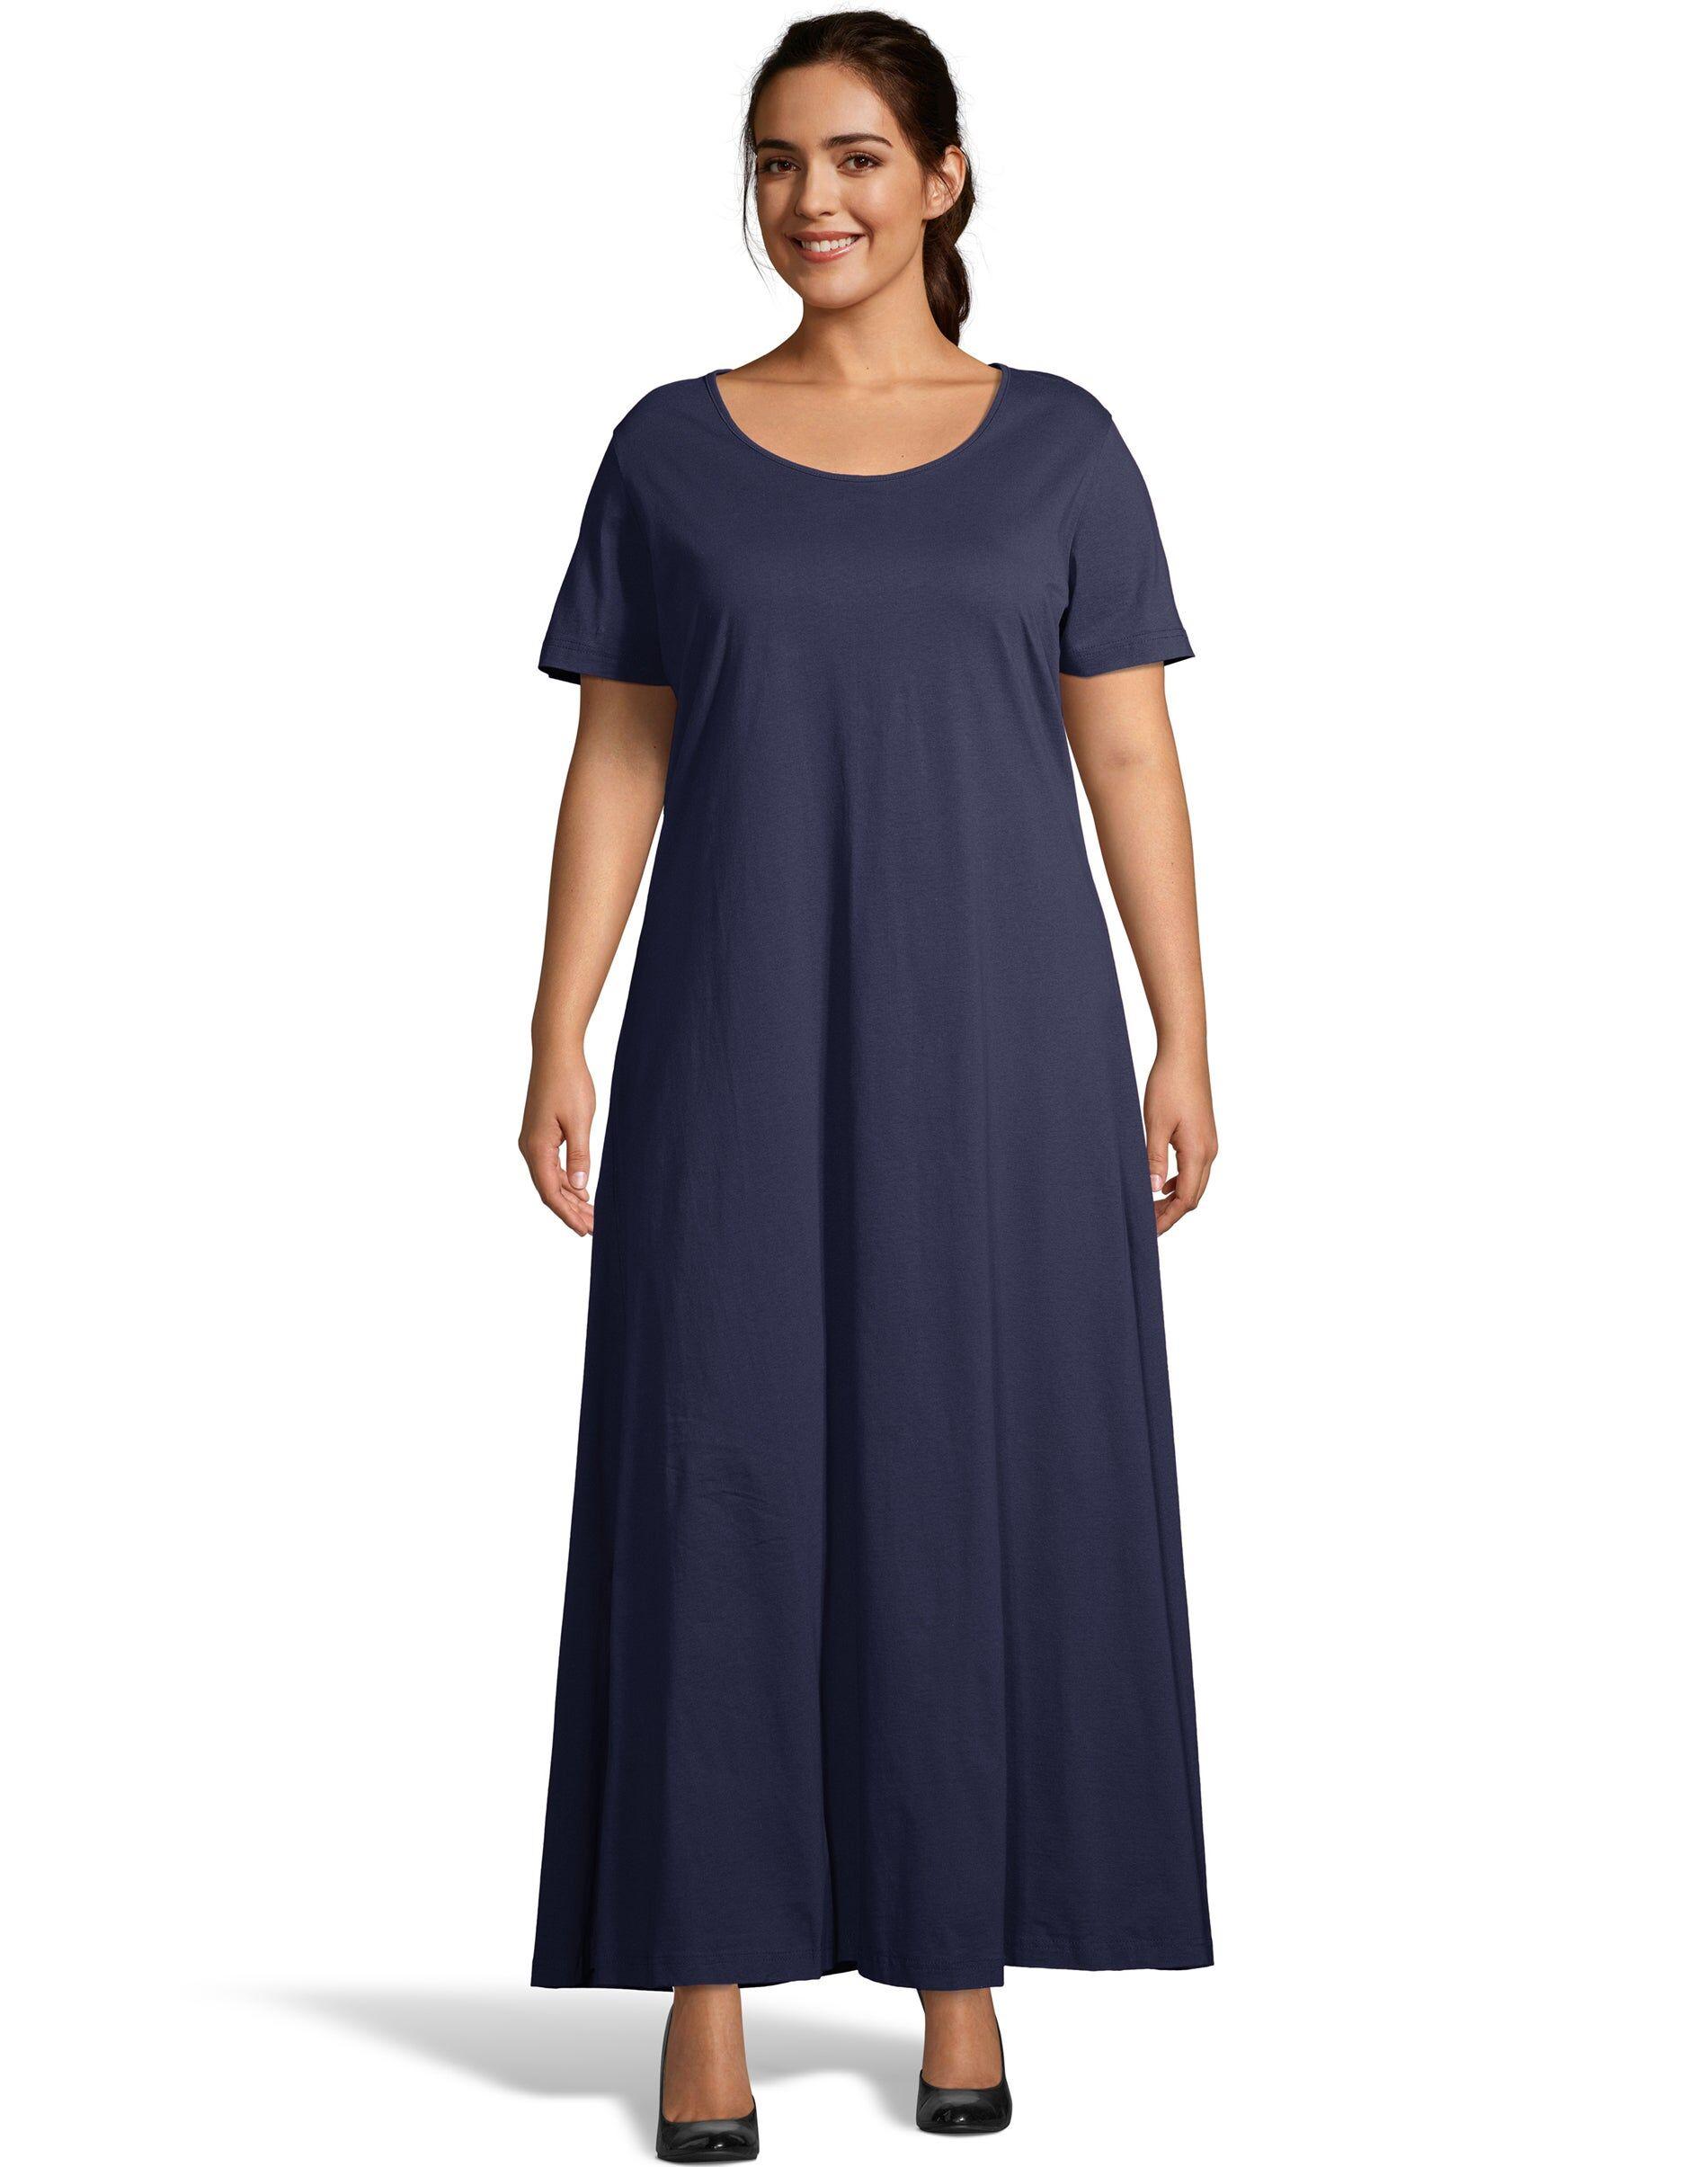 Just My Size Jersey Matchables Maxi Dress Navy 4X Women's